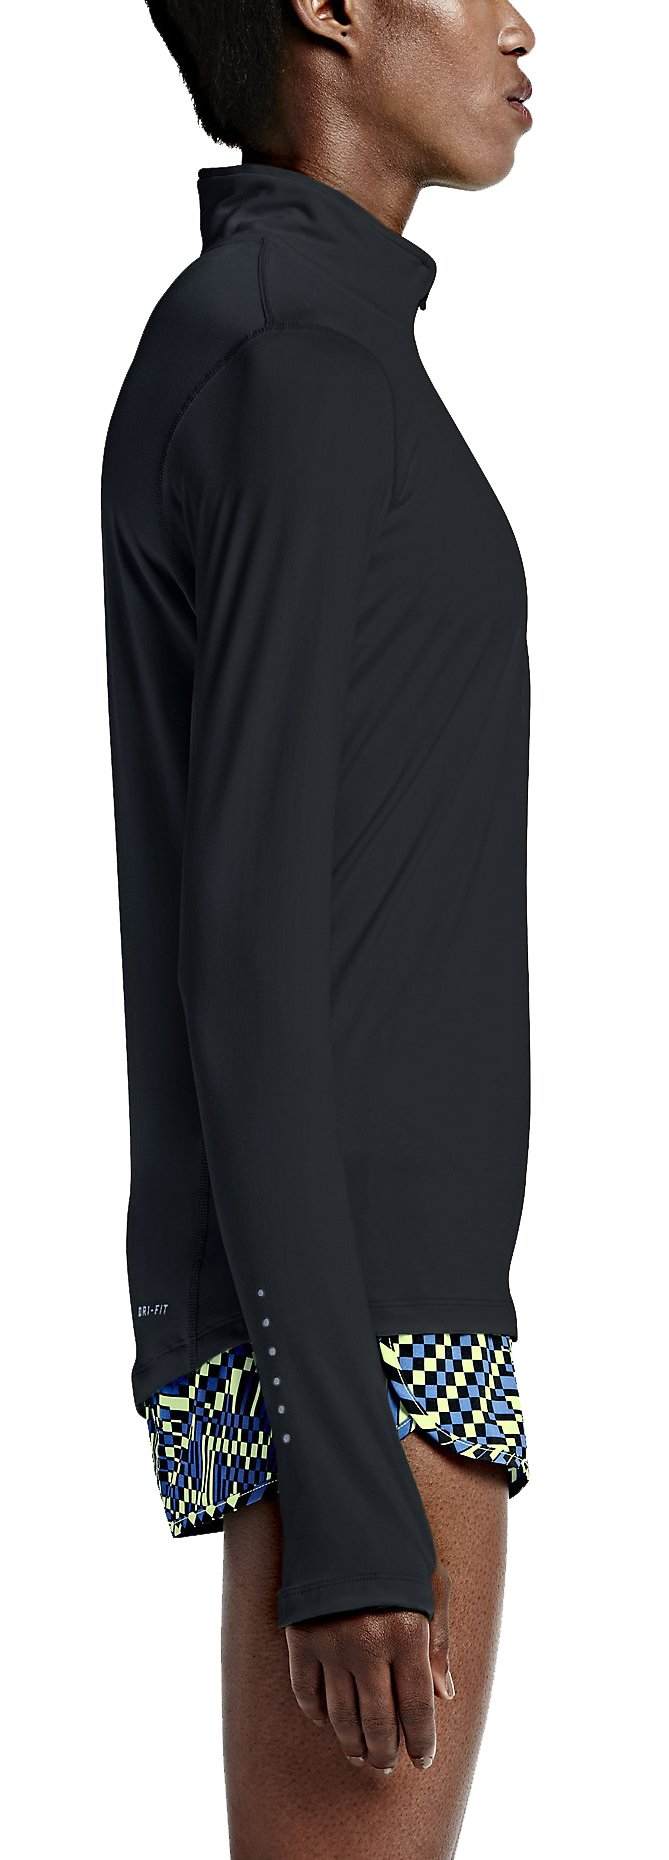 Long Sleeve T Shirt Nike Element Half Zip